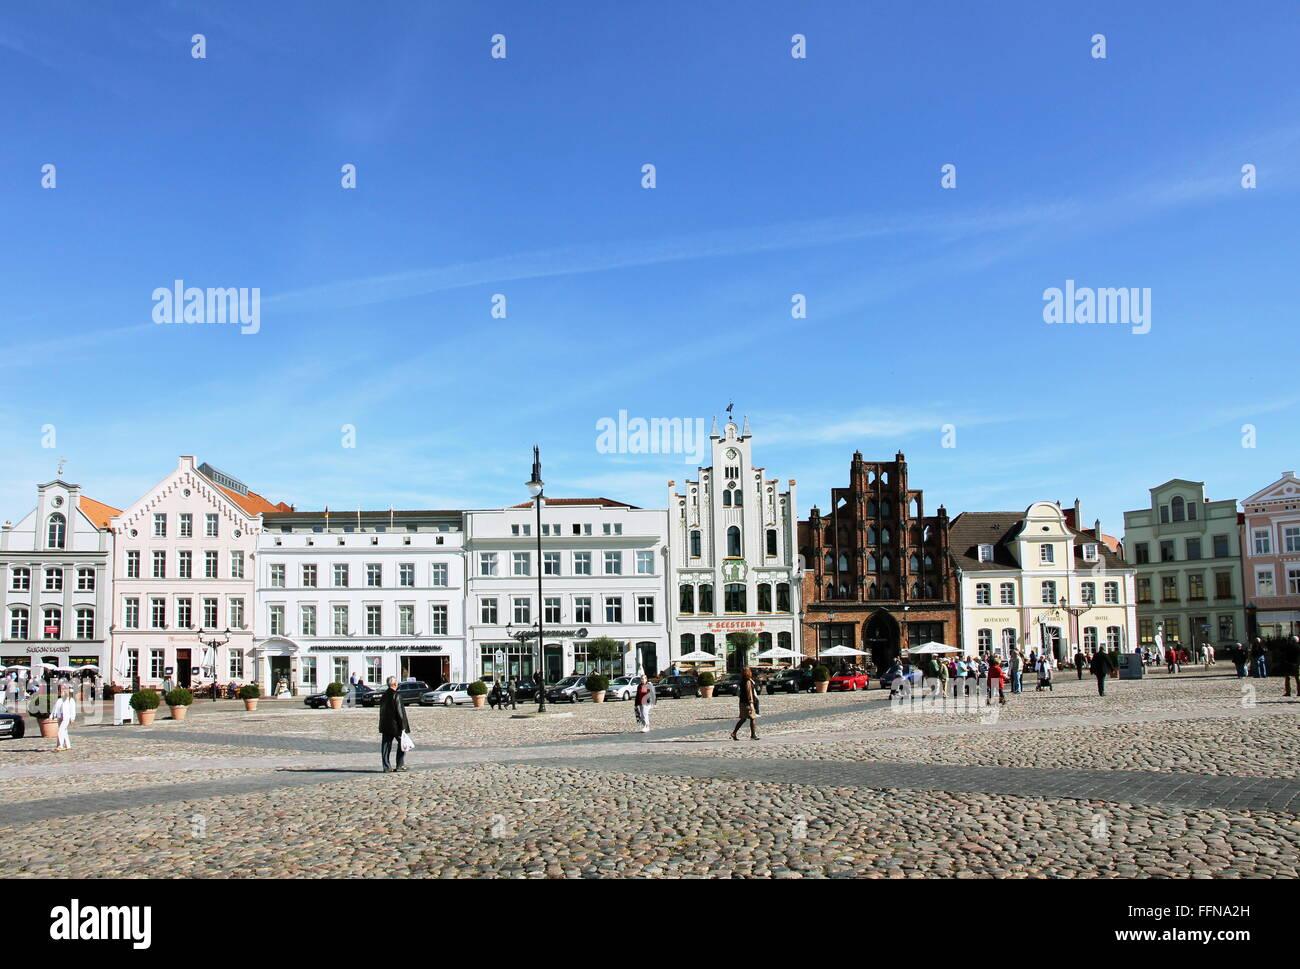 geography / travel, Germany, Mecklenburg-West Pomerania, Wismar, Am Markt, market-place, 'Alter Schwede' - Stock Image